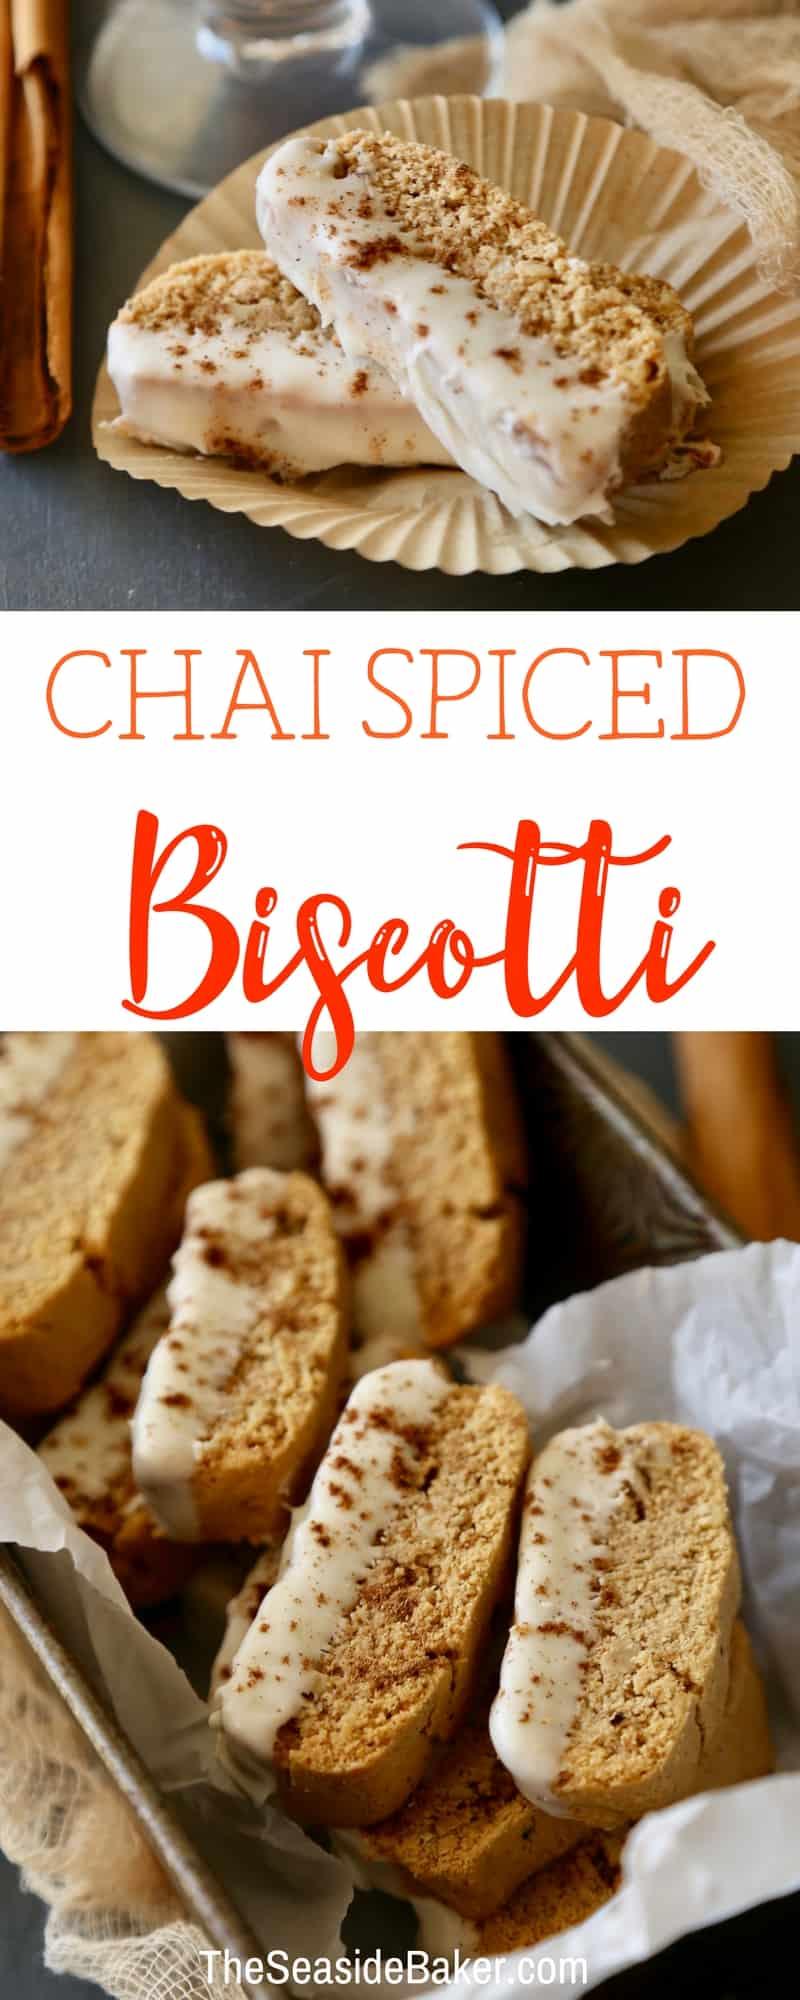 Chai Spiced Biscotti